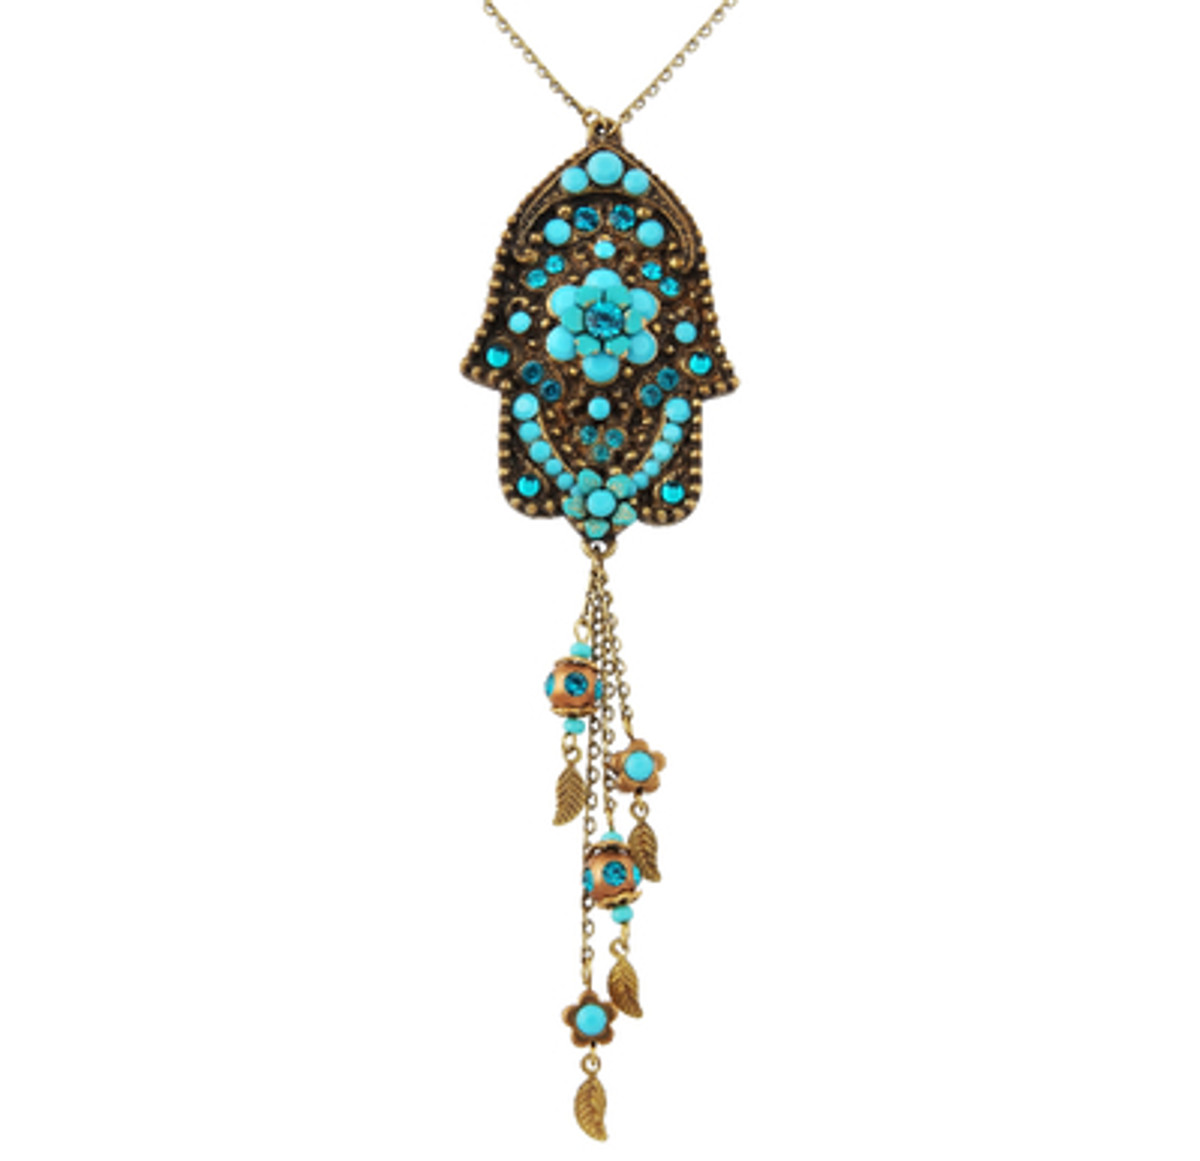 Evil Eye Hamsa Necklace With Dangle Leaves - Multi Color